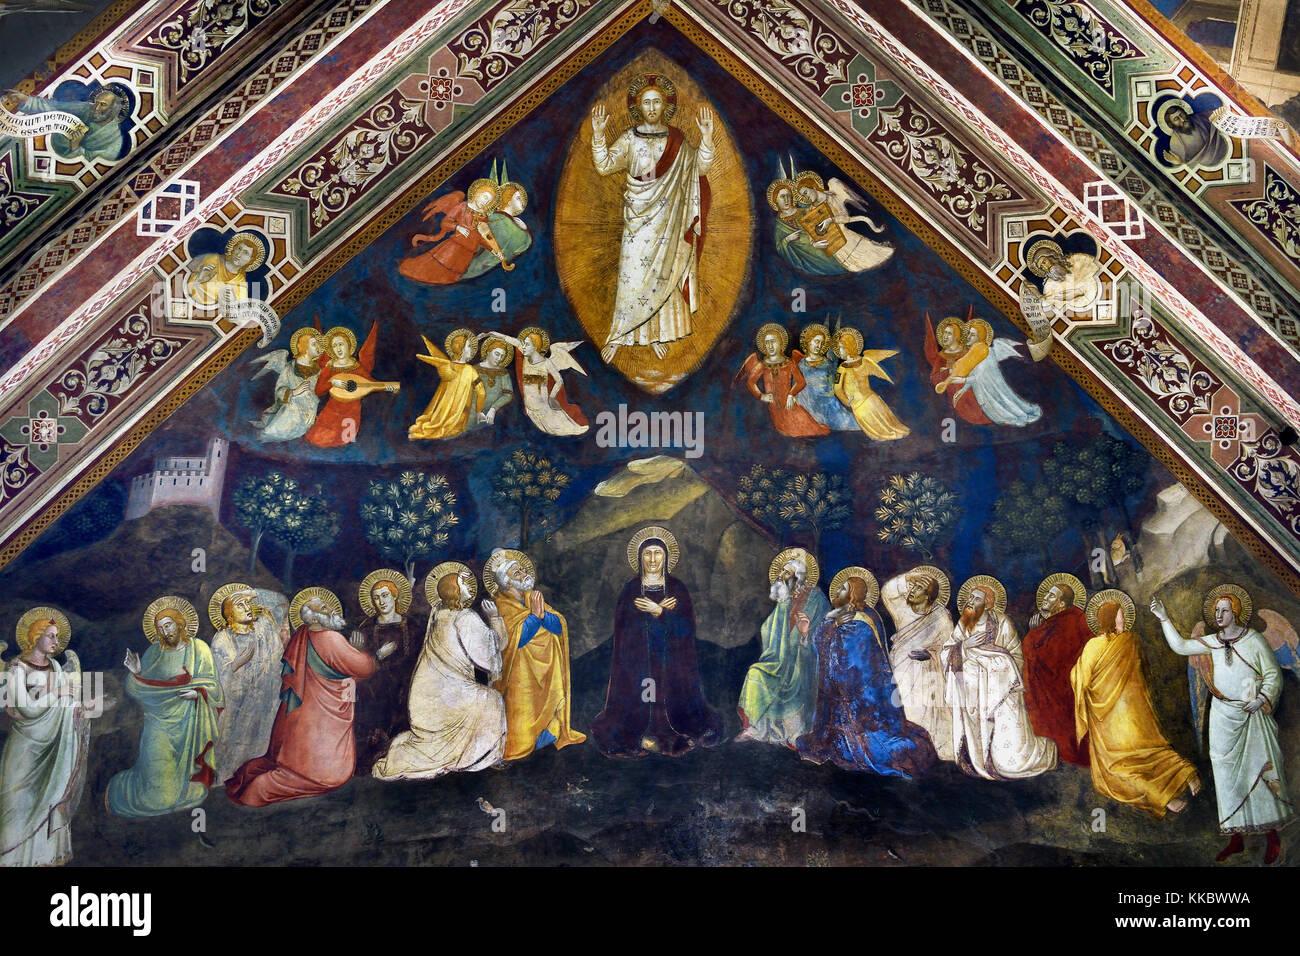 Jesus and the Twelve Apostles, by Andrea di Bonaiuto, 1365-1367, Spanish Chapel,  Basilica of Santa Maria Novella - Stock Image